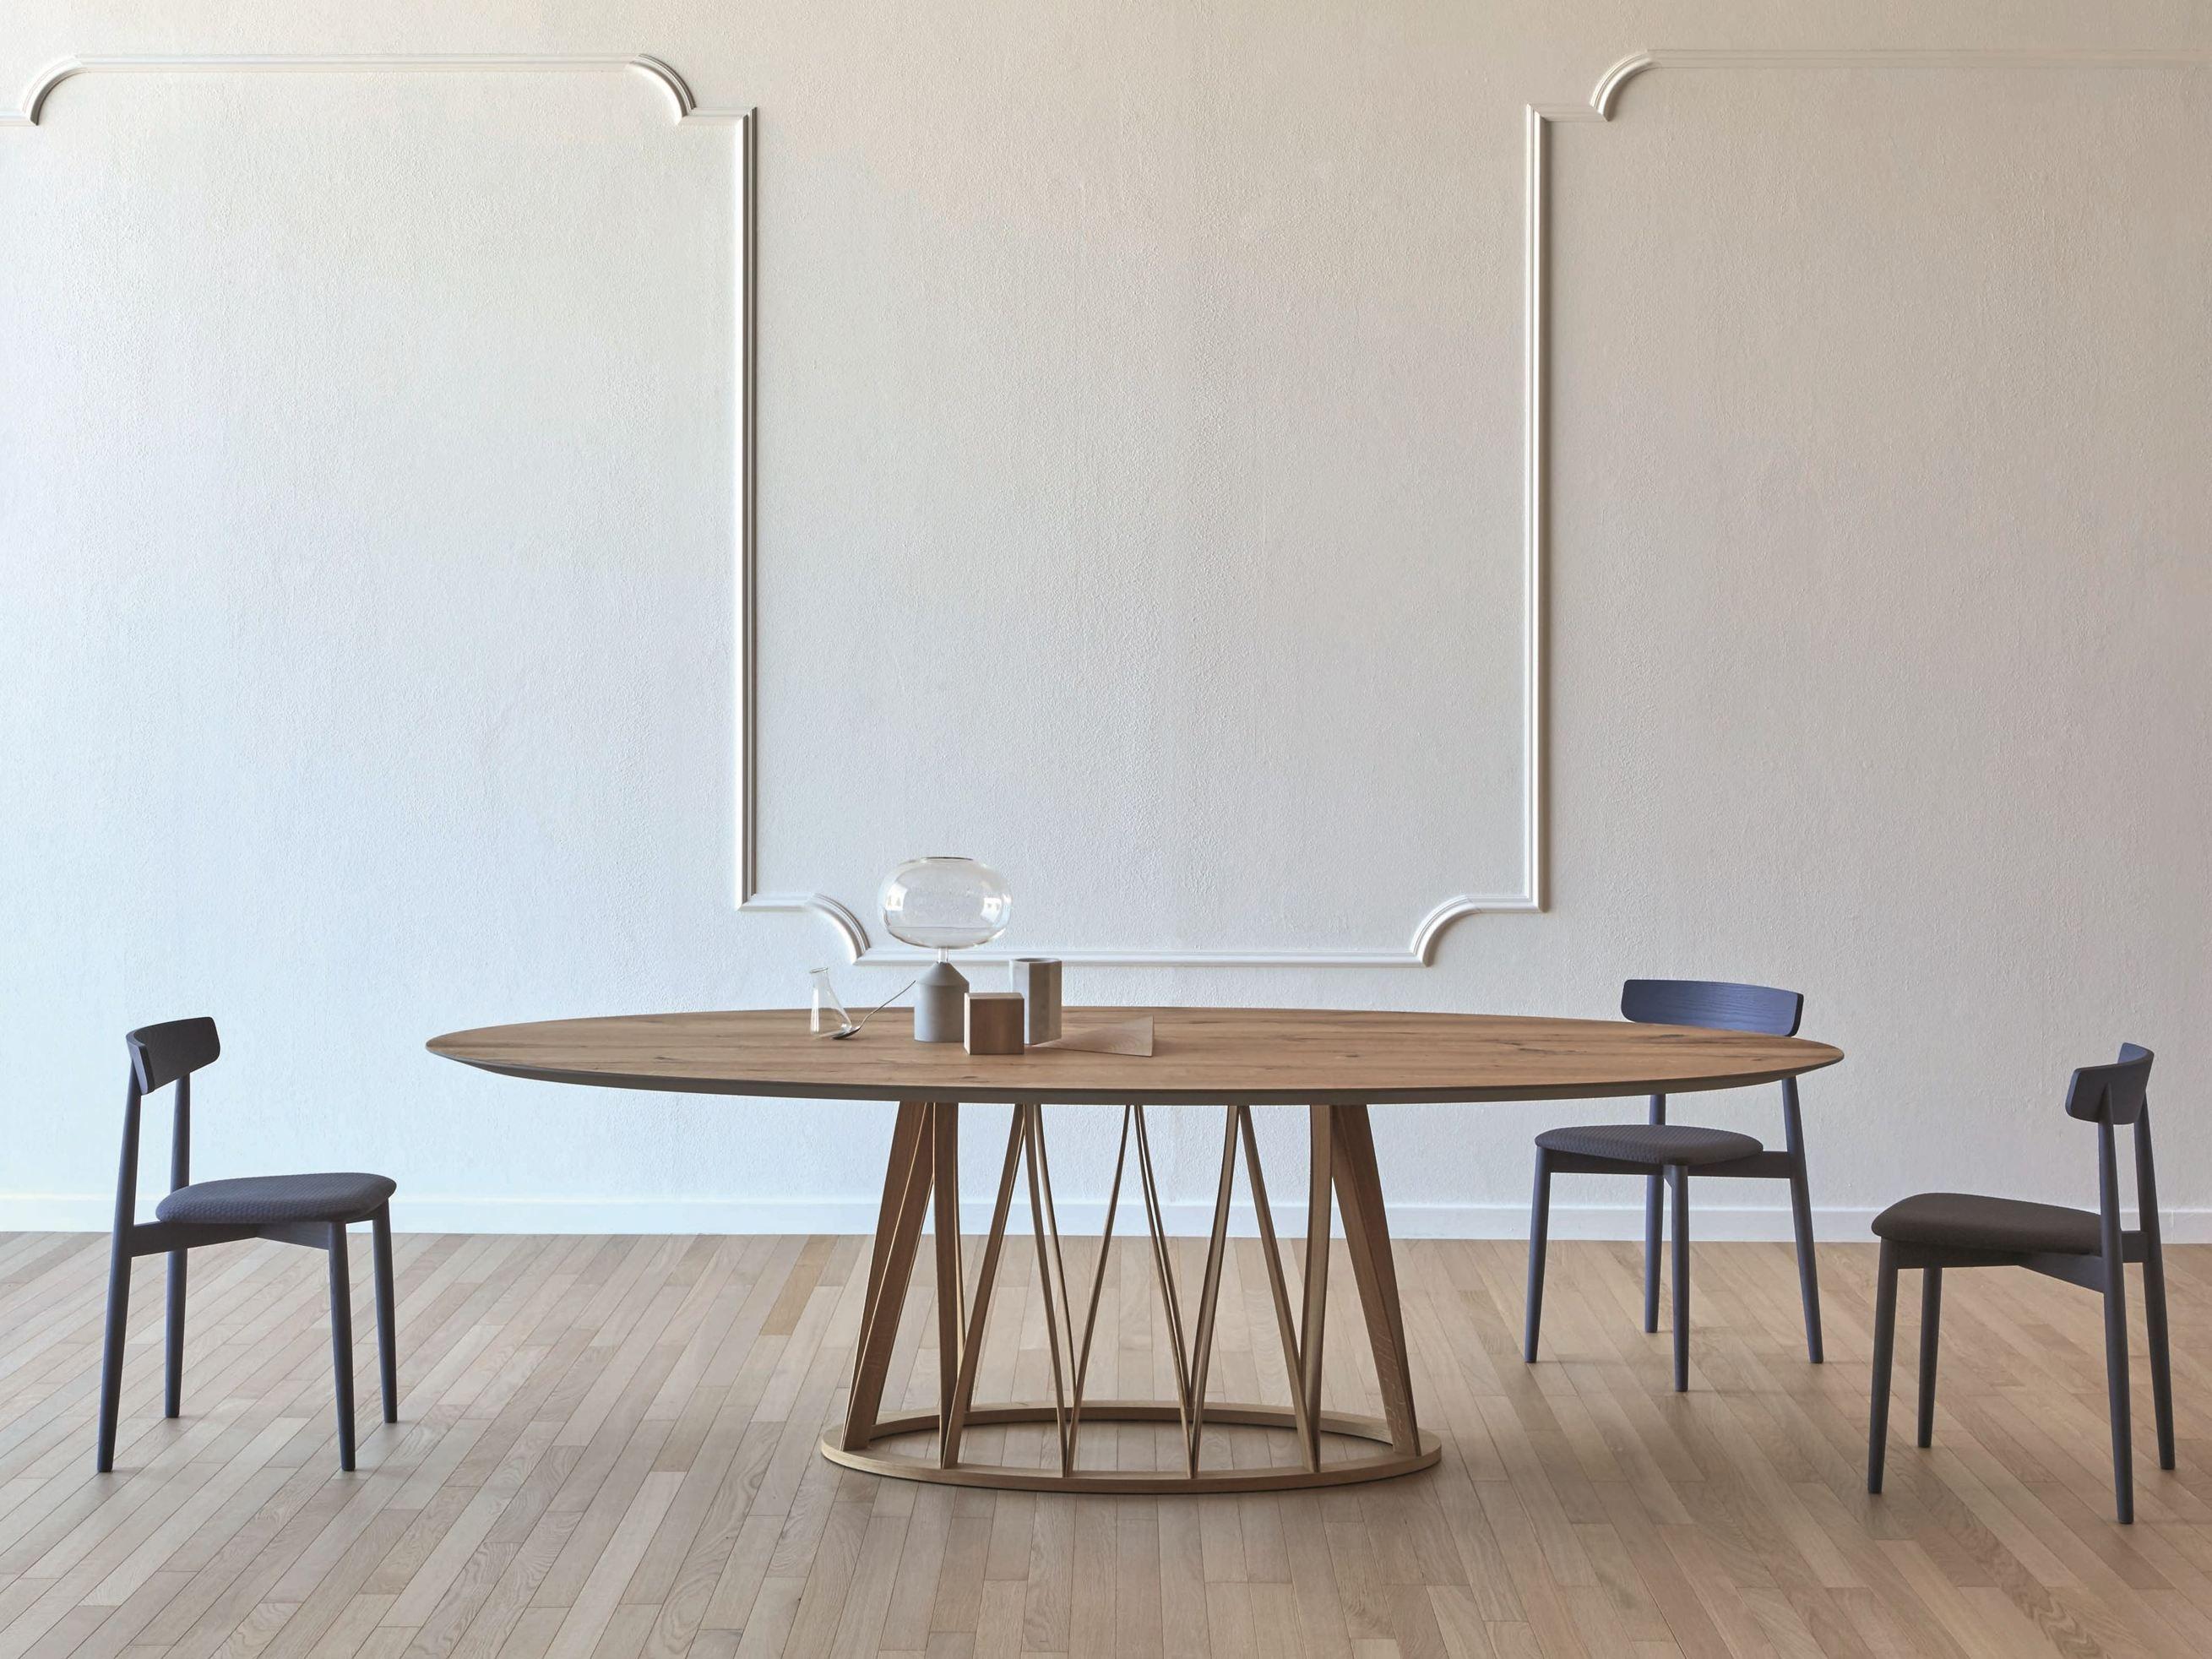 ACCO | Tisch aus Holz - Eettafel en Interieur